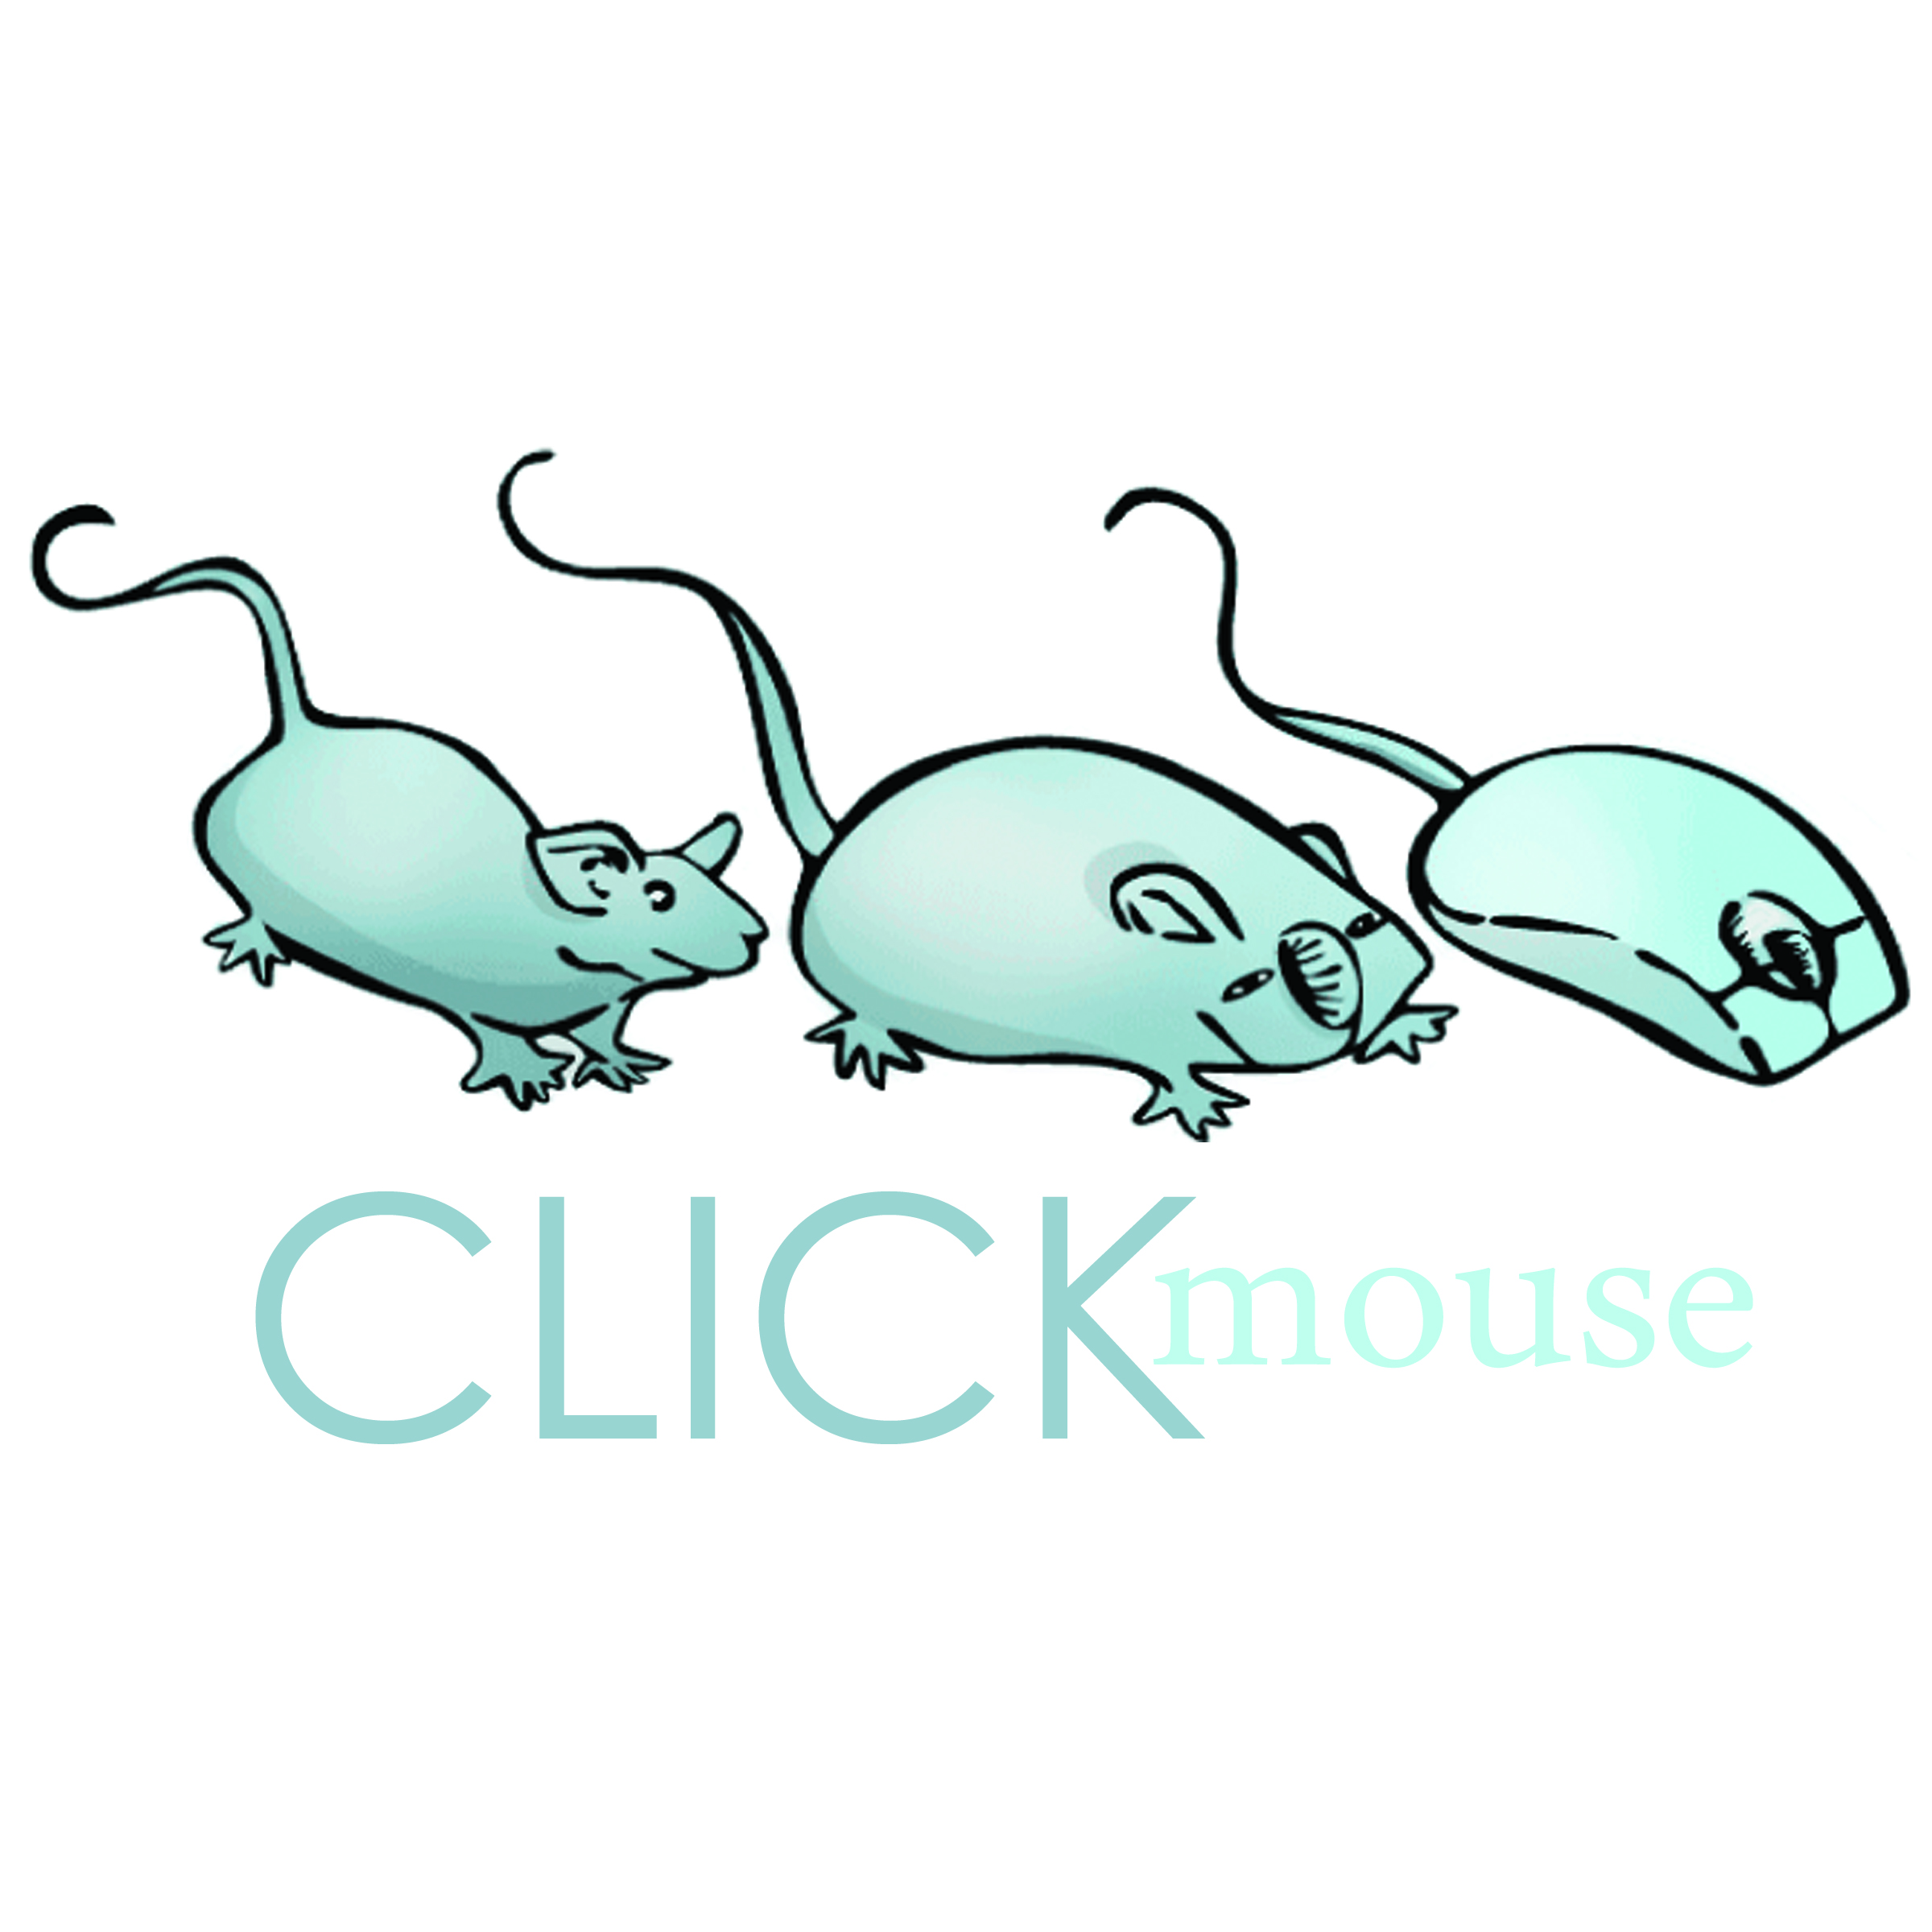 illustrated logos